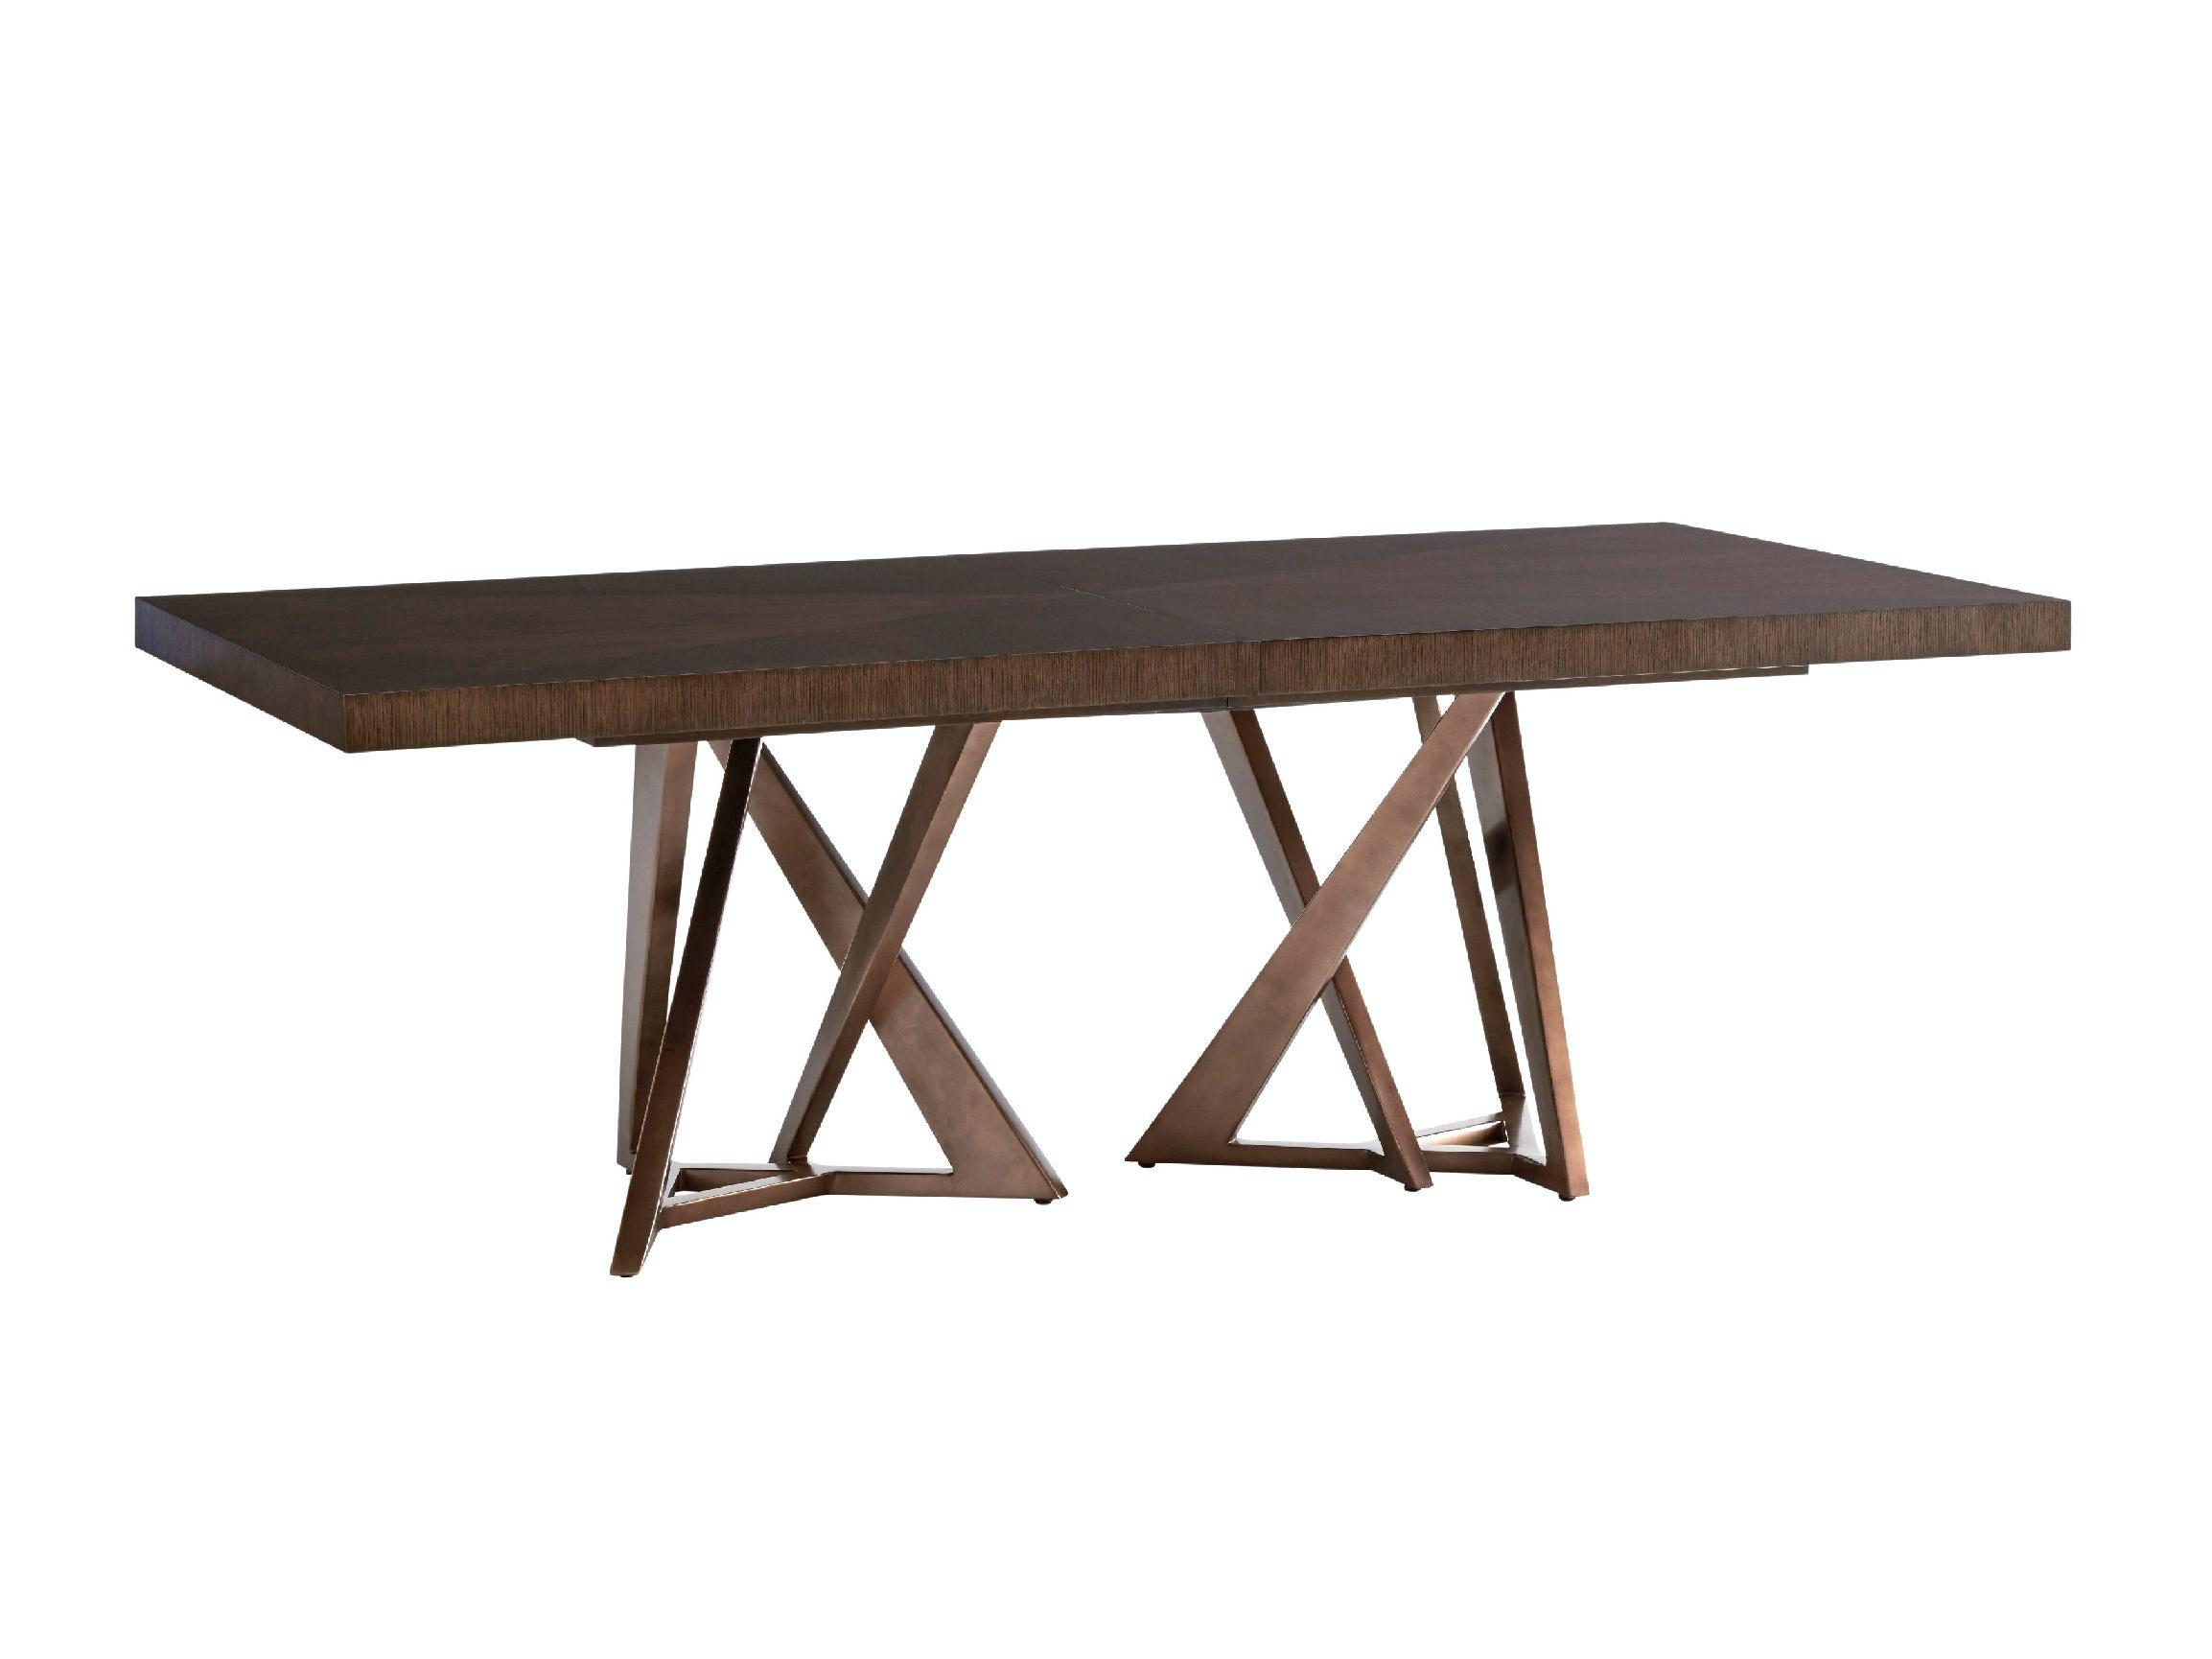 rectangular pedestal dining table Loggia Rectangular Double Pedestal Dining Table 790 876C rectangular pedestal dining table